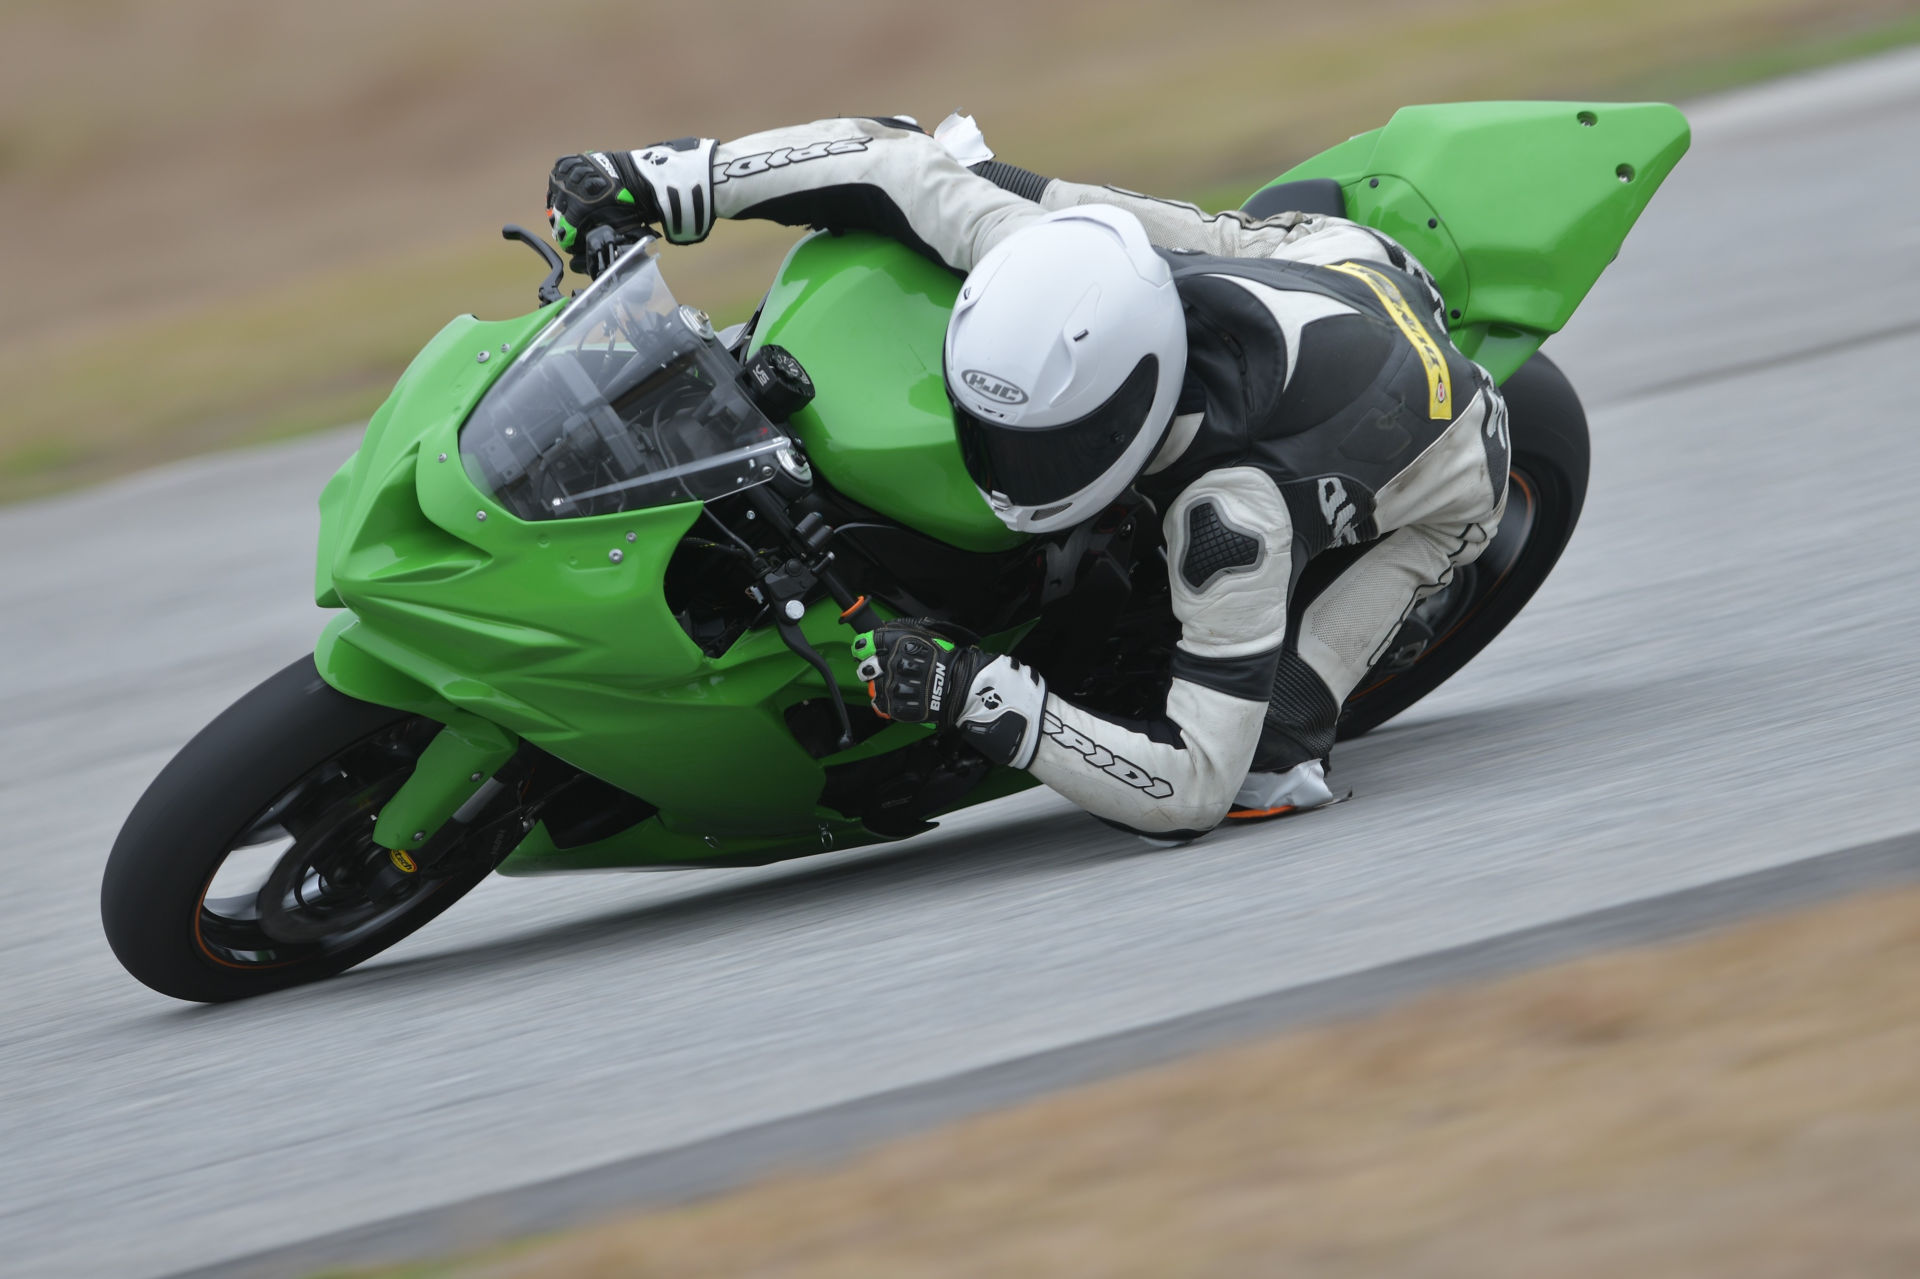 Dominic Doyle during pre-season testing on his new BARTCON Racing Kawasaki ZX-6R. Photo courtesy BARTCON Racing.